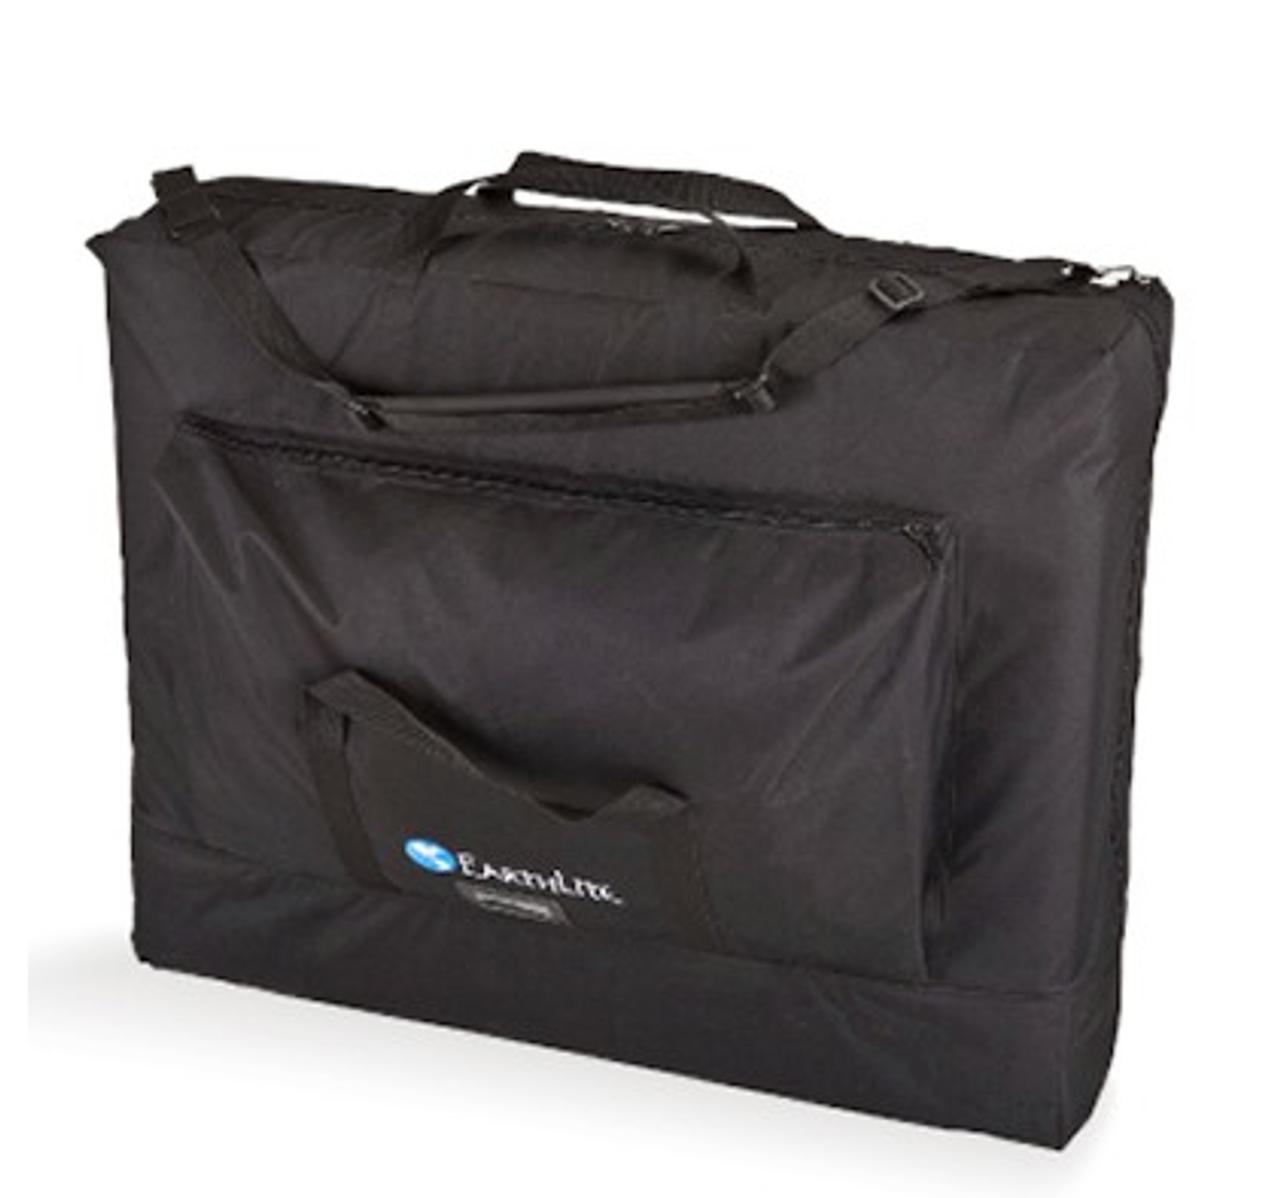 Transit Bag included